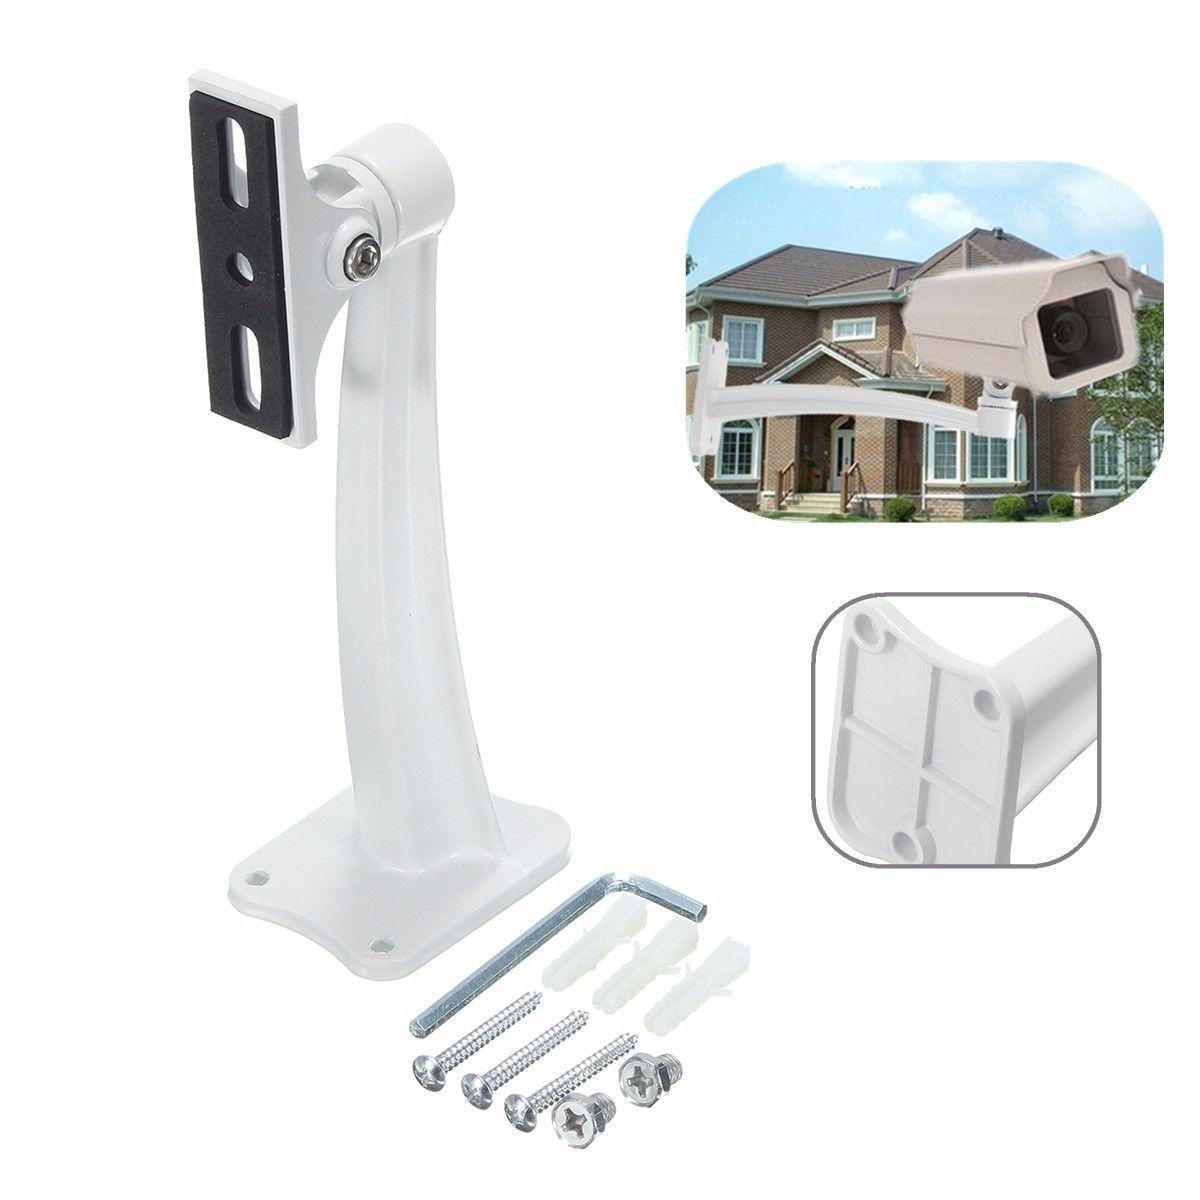 ZSX-507L Wall Mount Bracket Indoor Outdoor Home Surveillance For ...